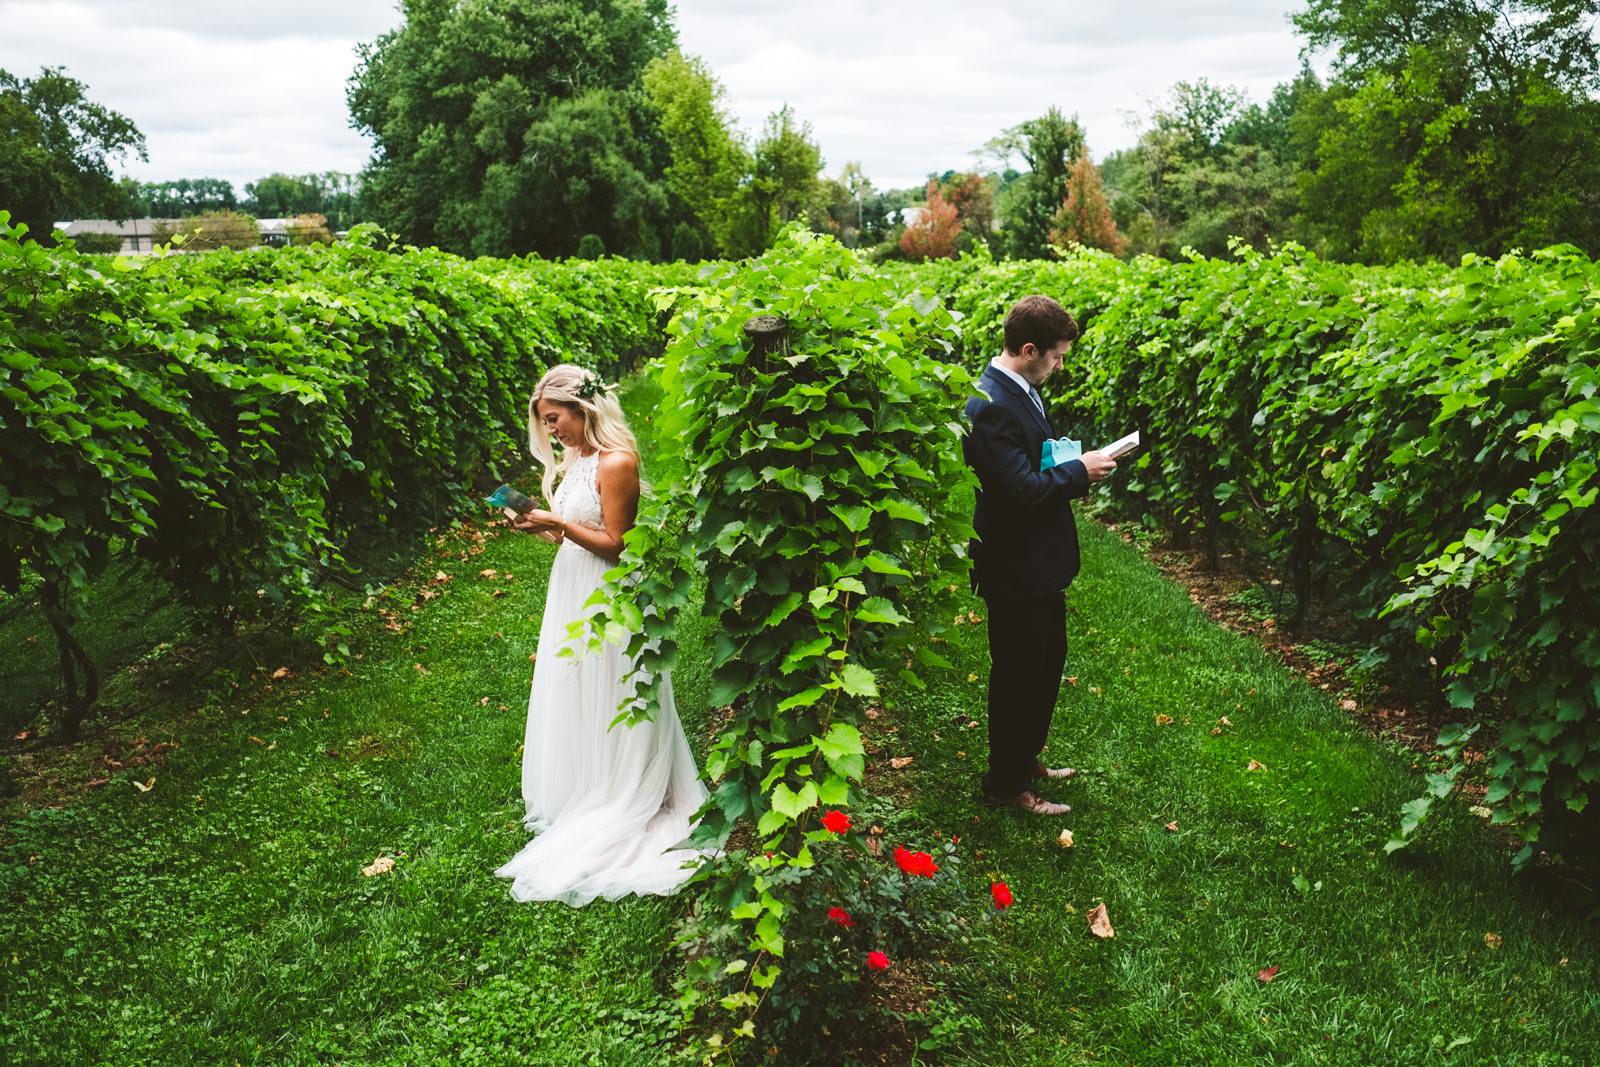 Cleveland Ohio Wedding Photographers with Bride and Groom at Gervasi Vineyard on Wedding Day